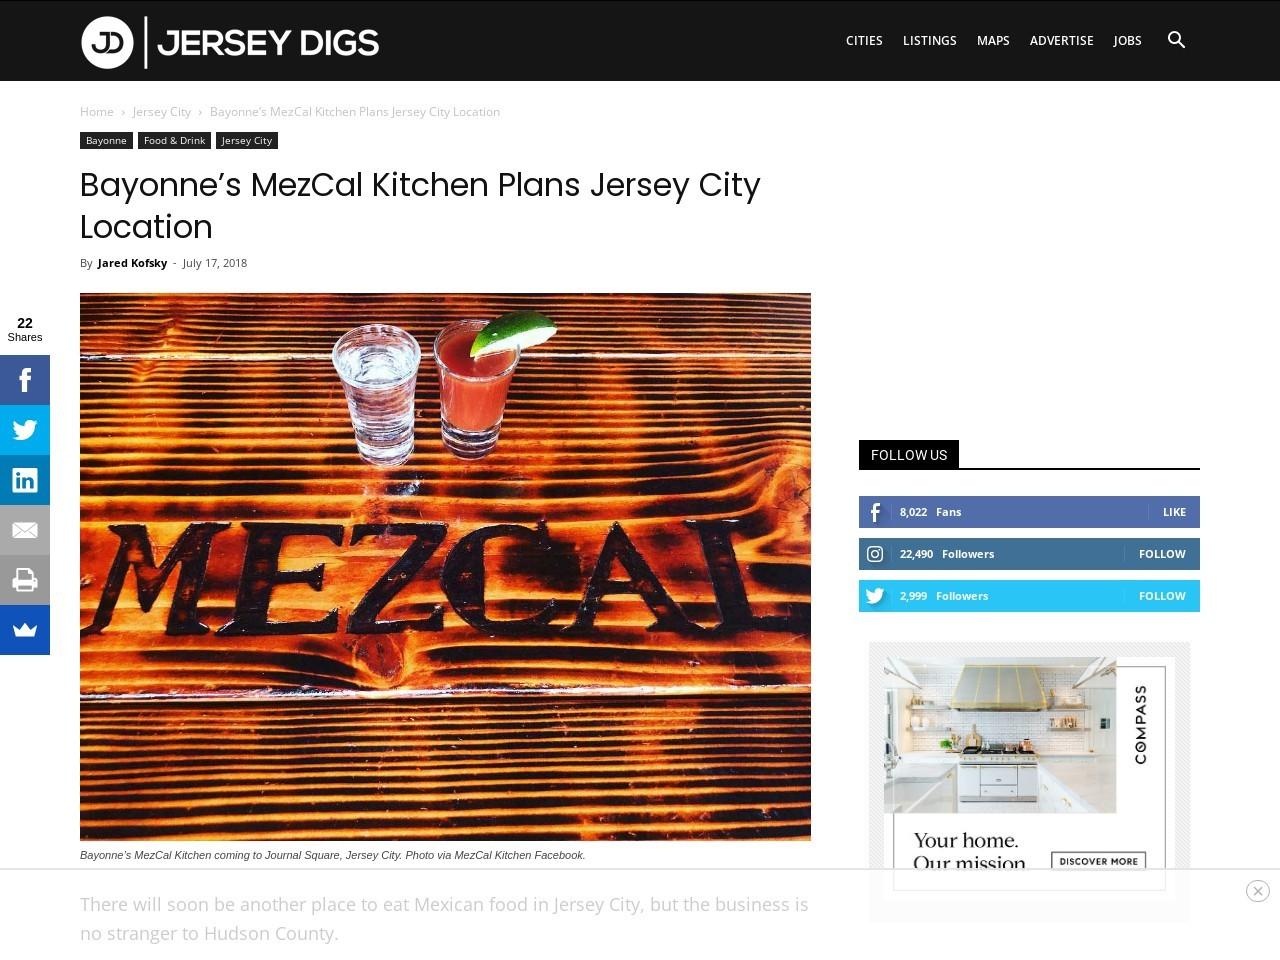 Bayonne's MezCal Kitchen Plans Jersey City Location